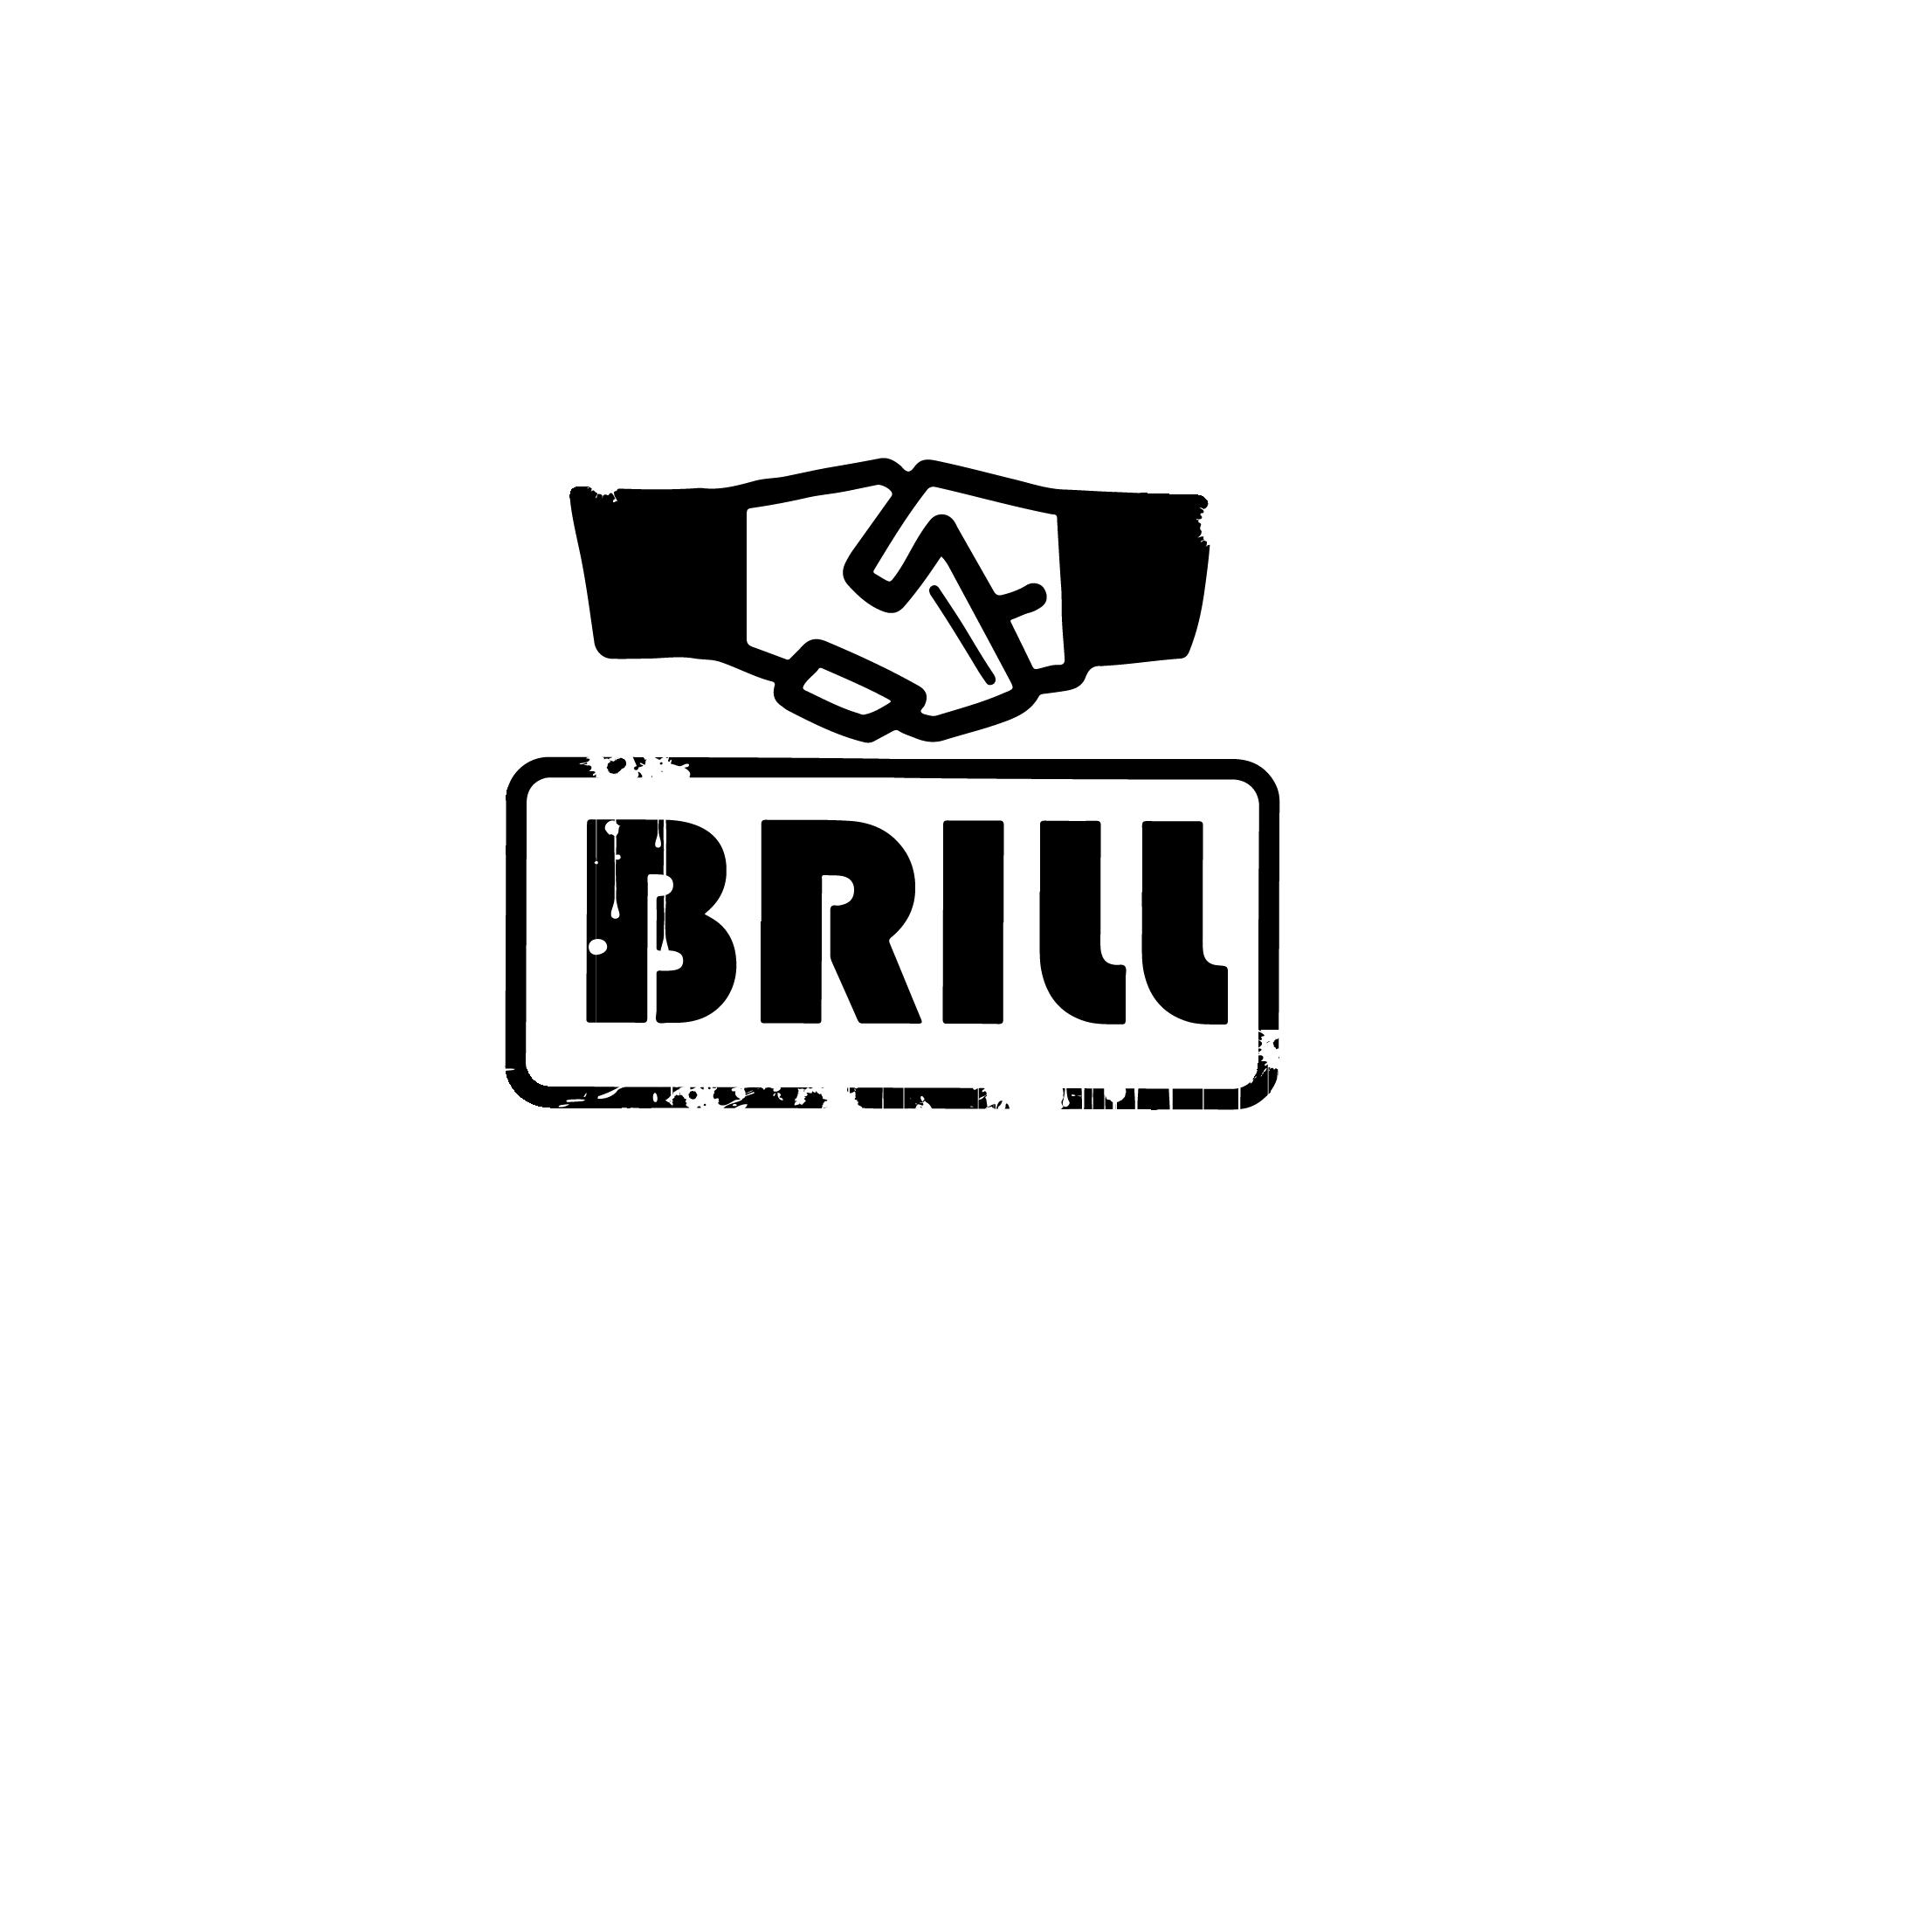 Brill Cleaner Ltd